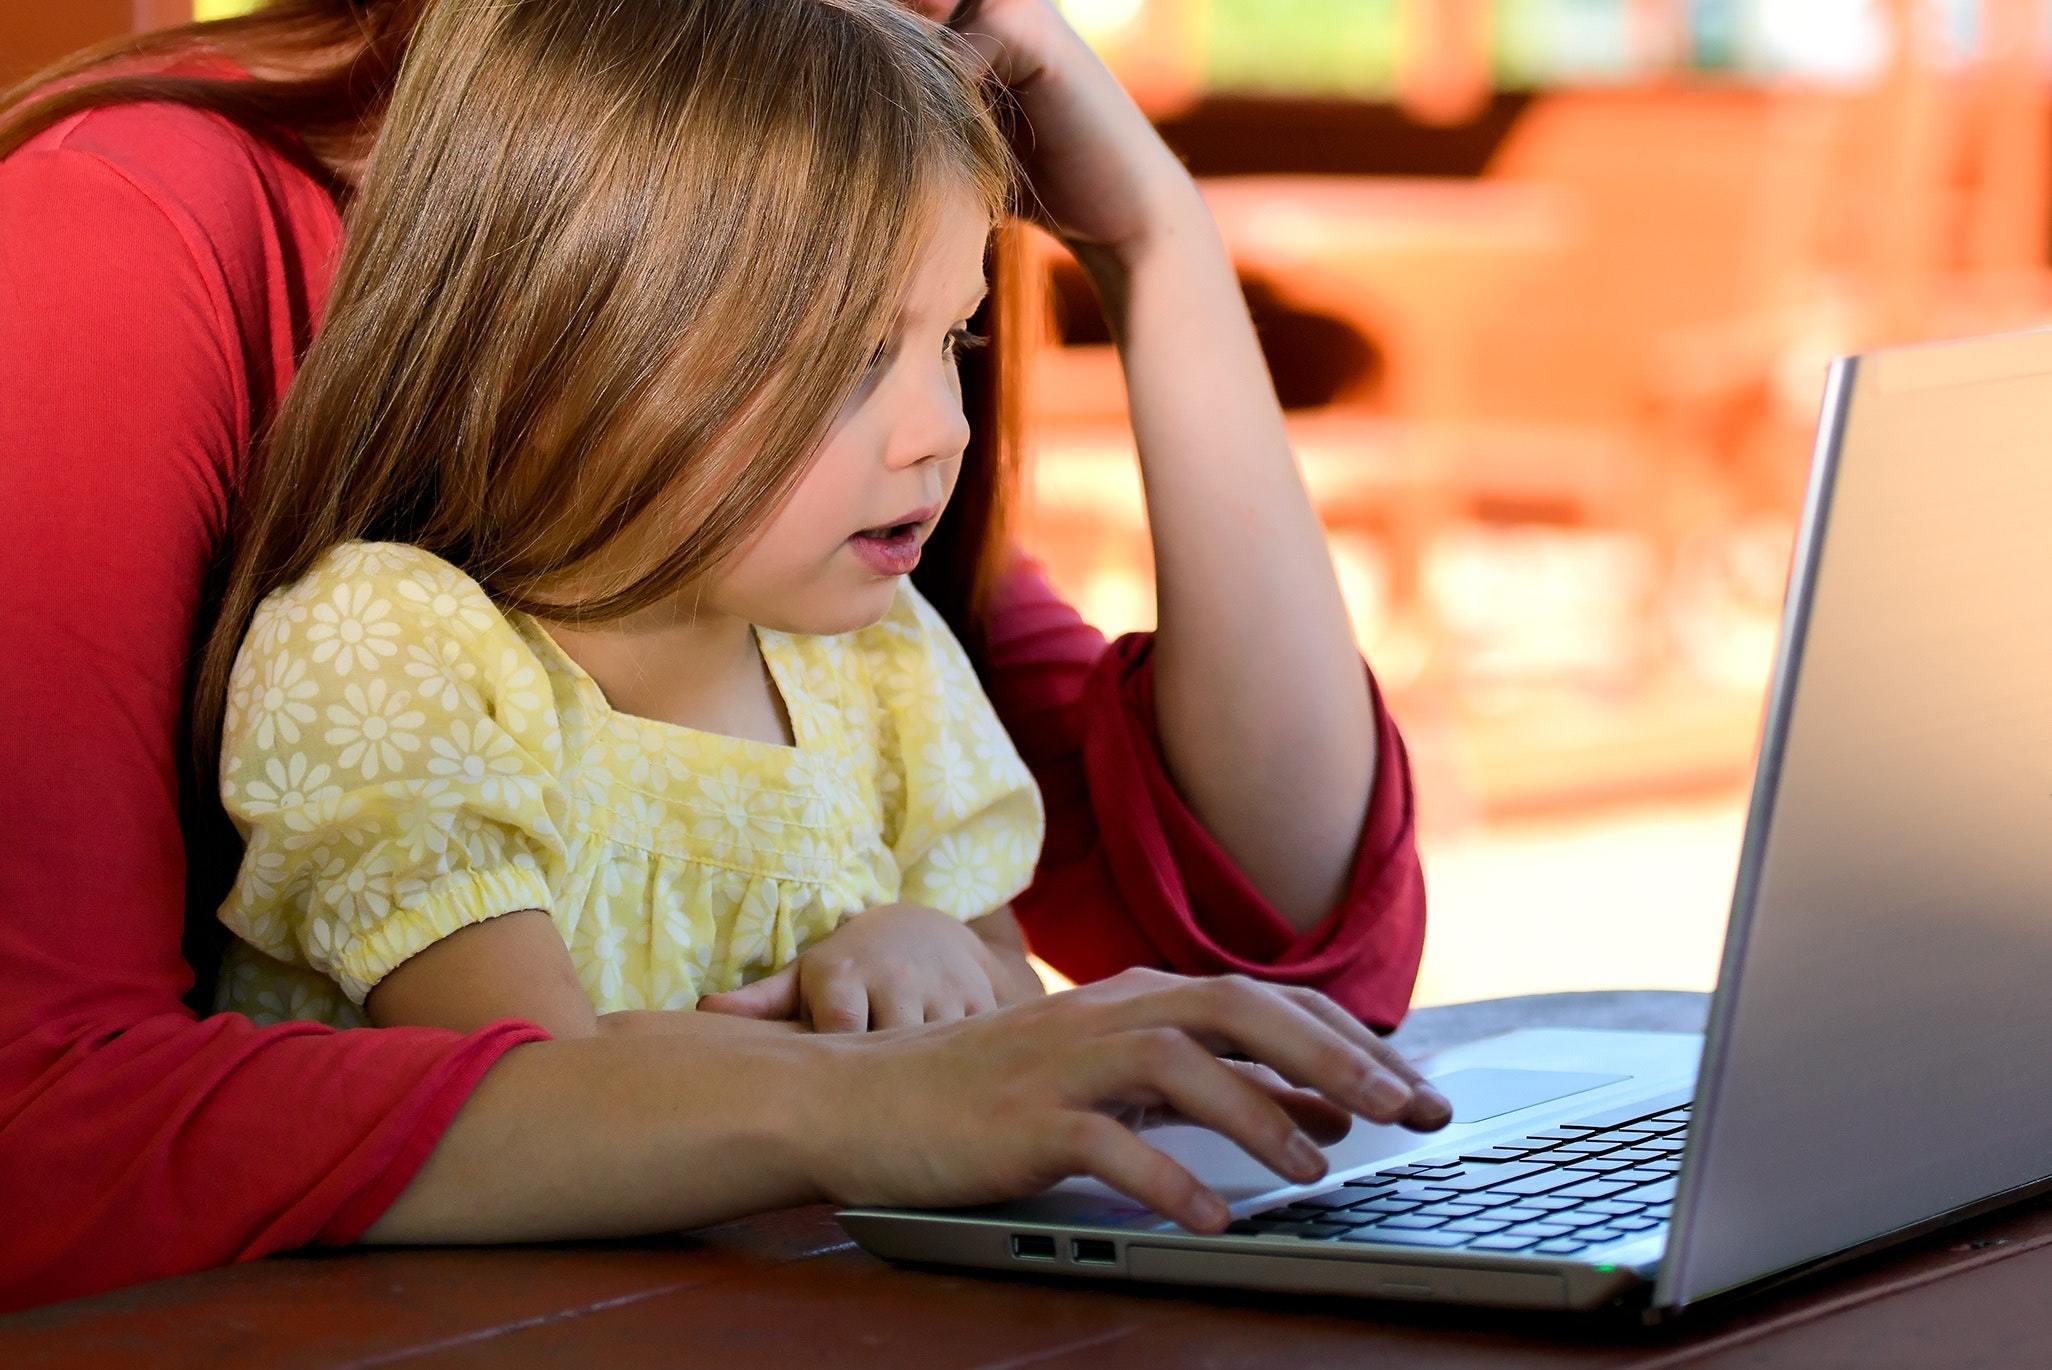 child computer cute 159848